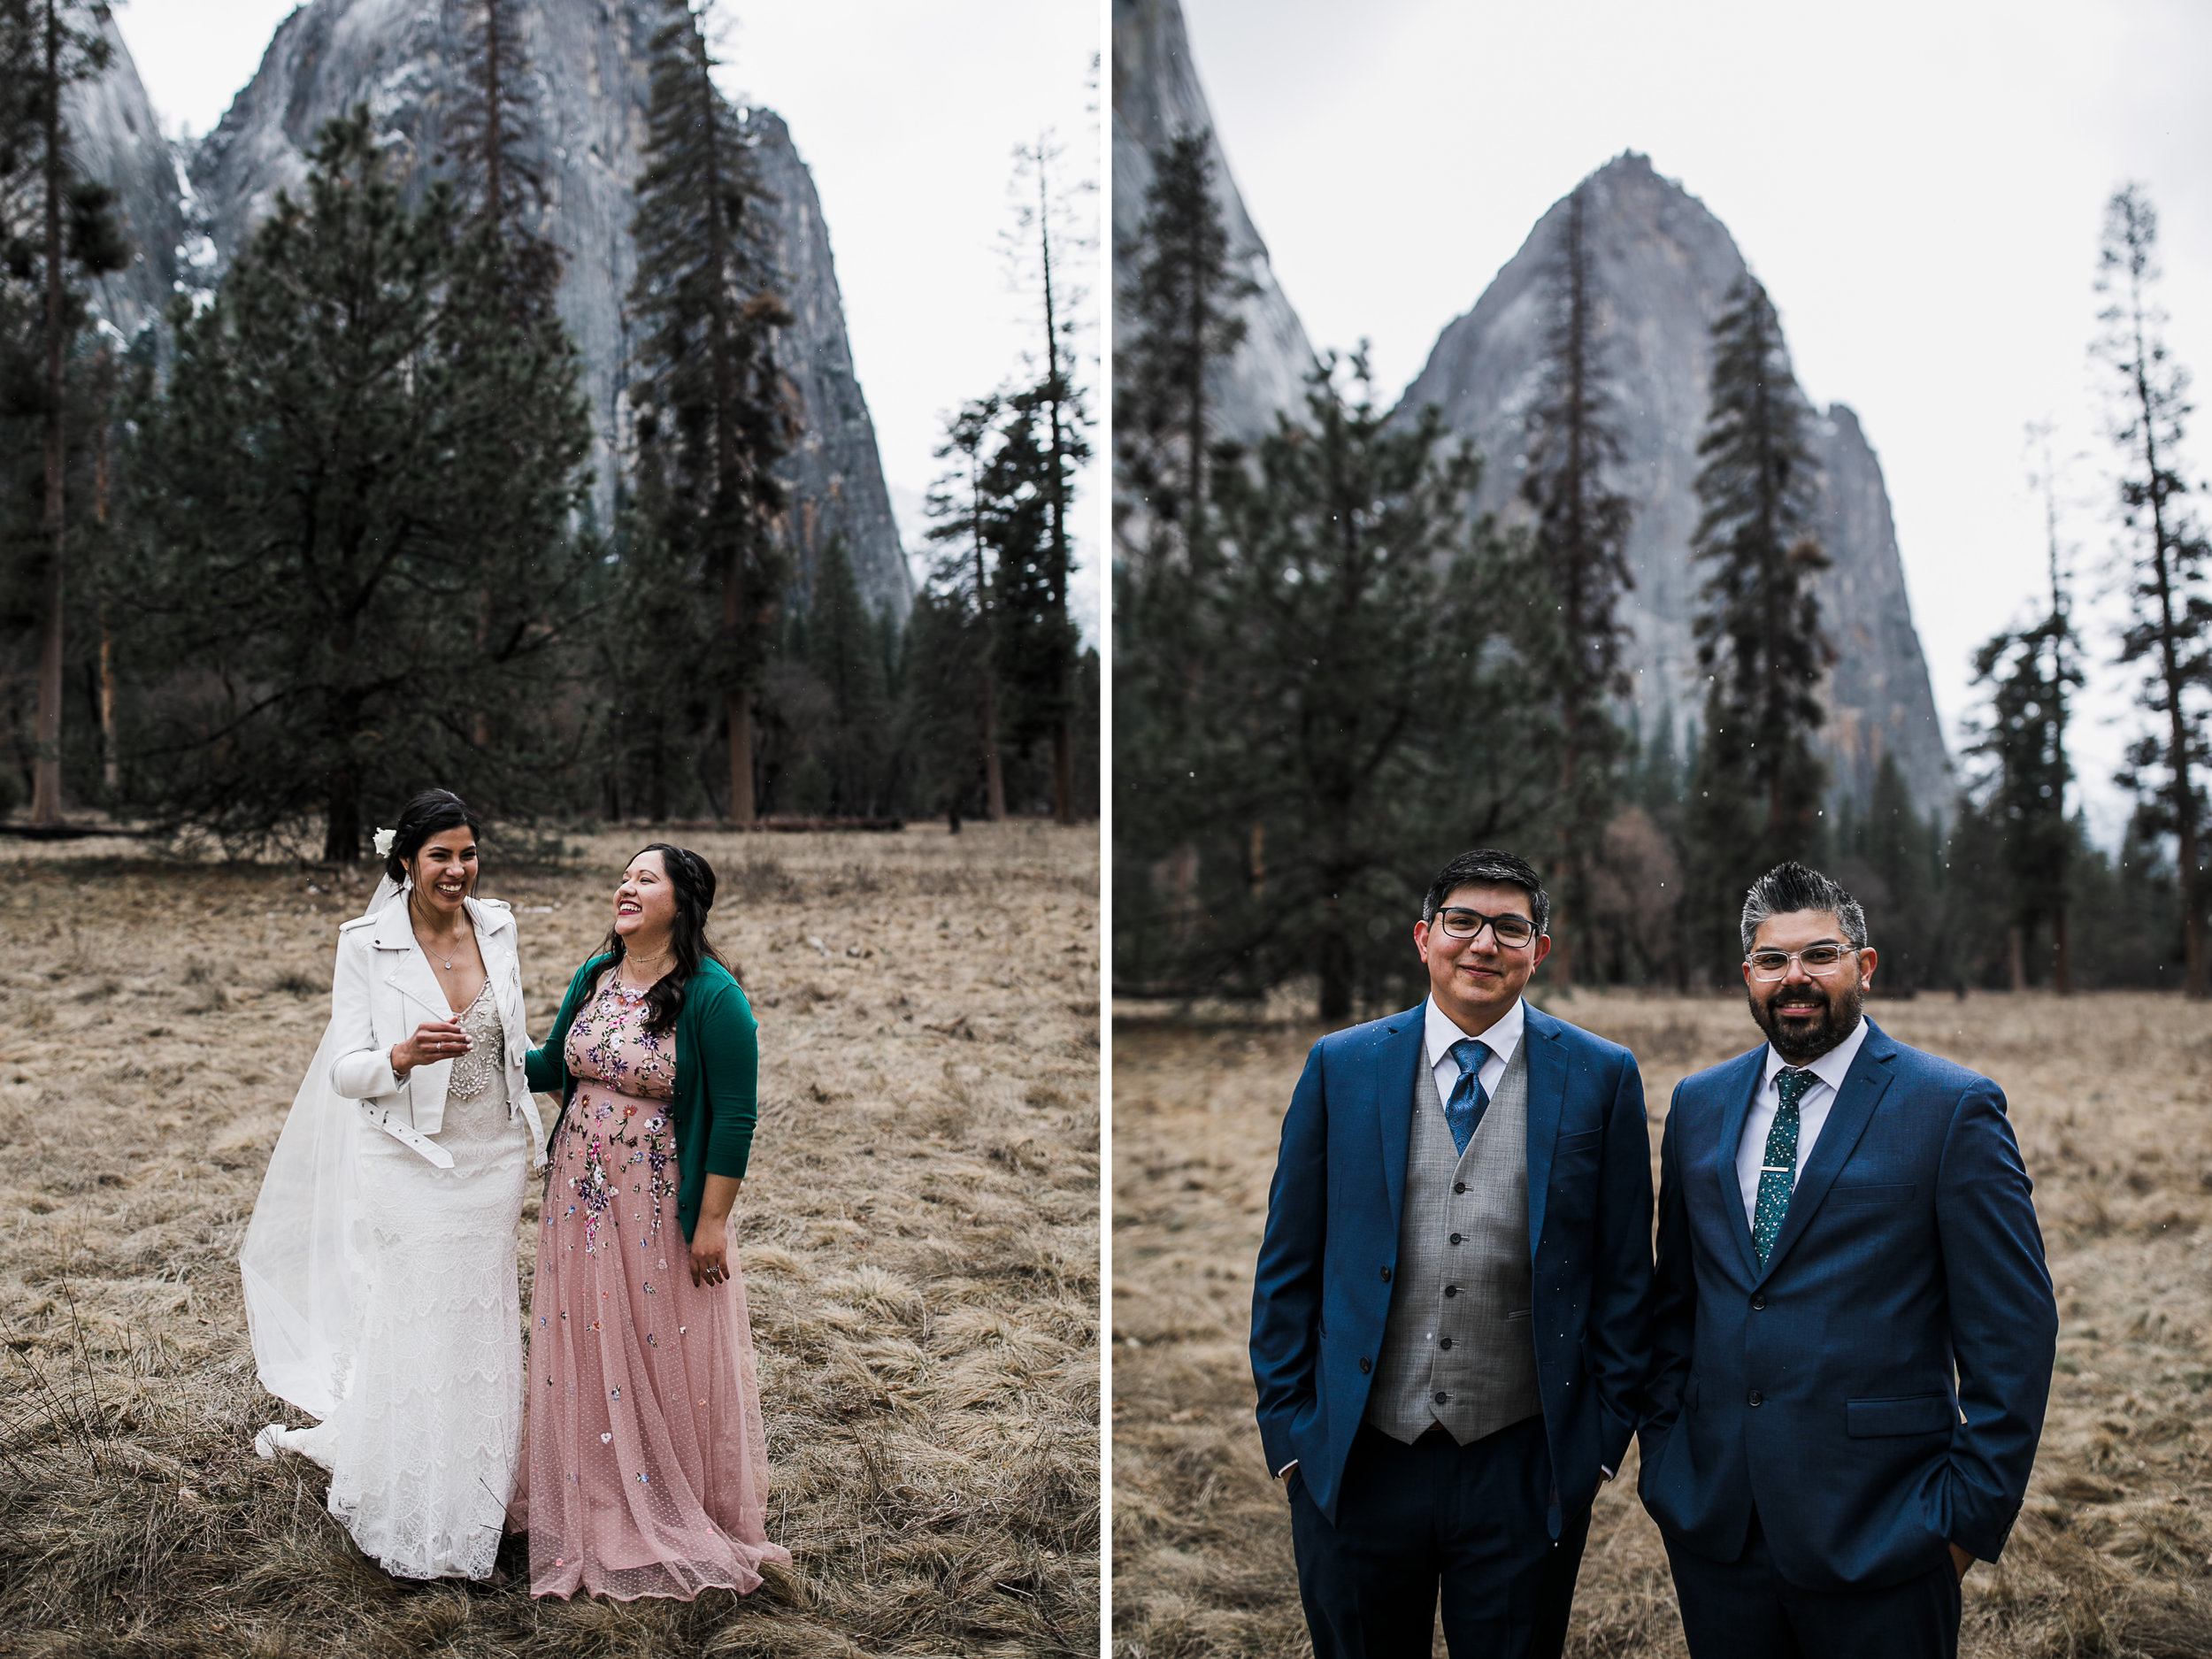 wedding day style in yosemite